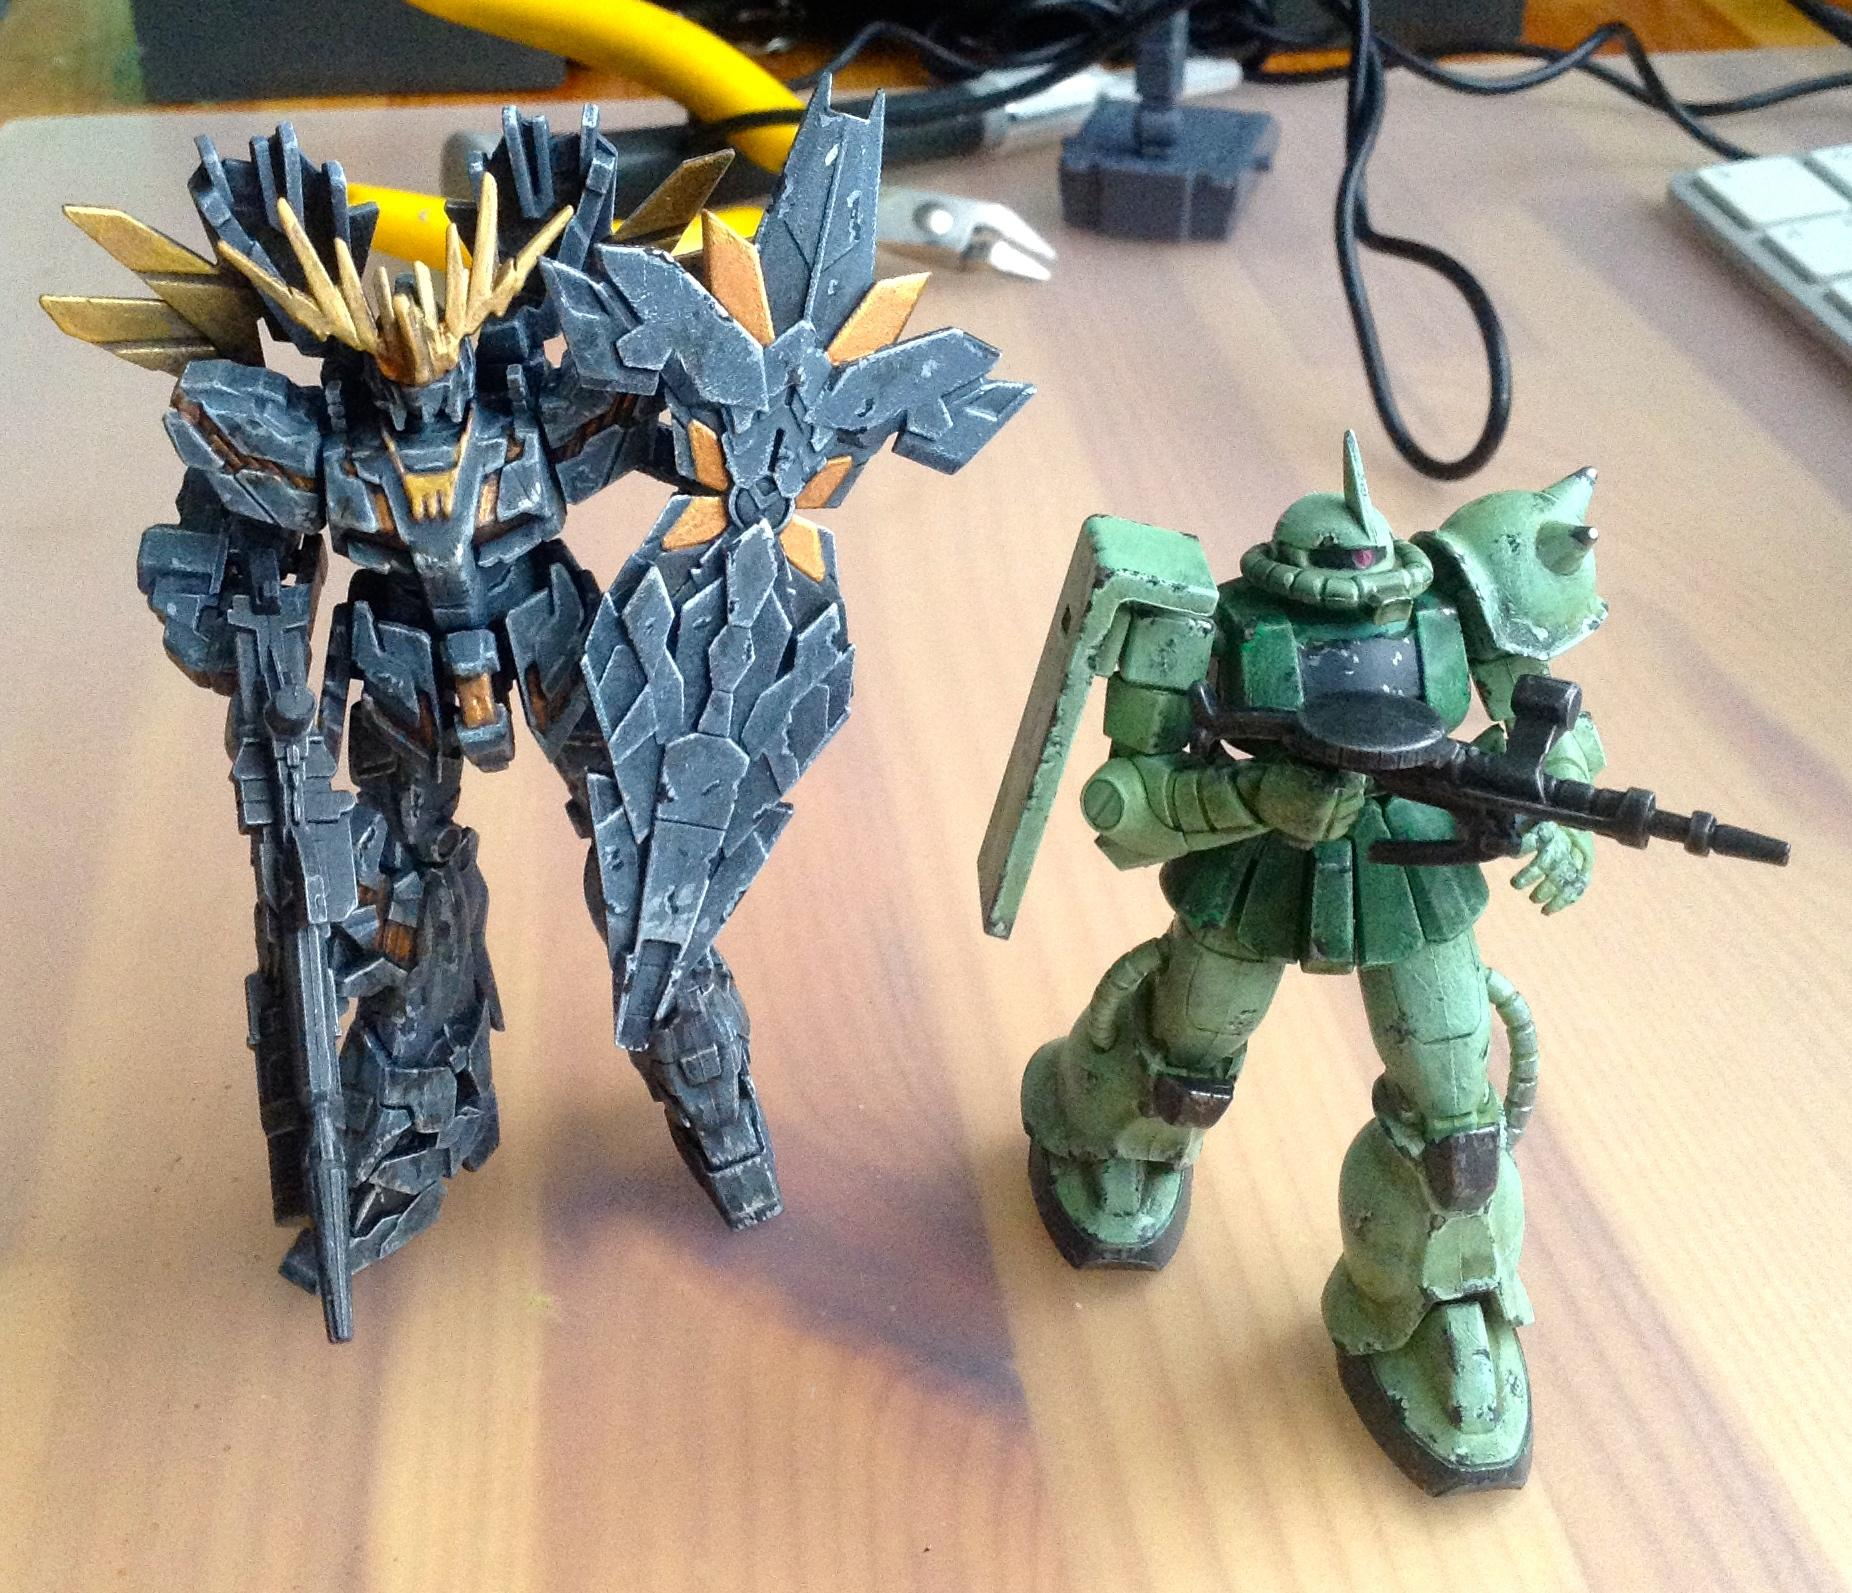 Bandai, Gundam, Riccardo Margarolo, Robot